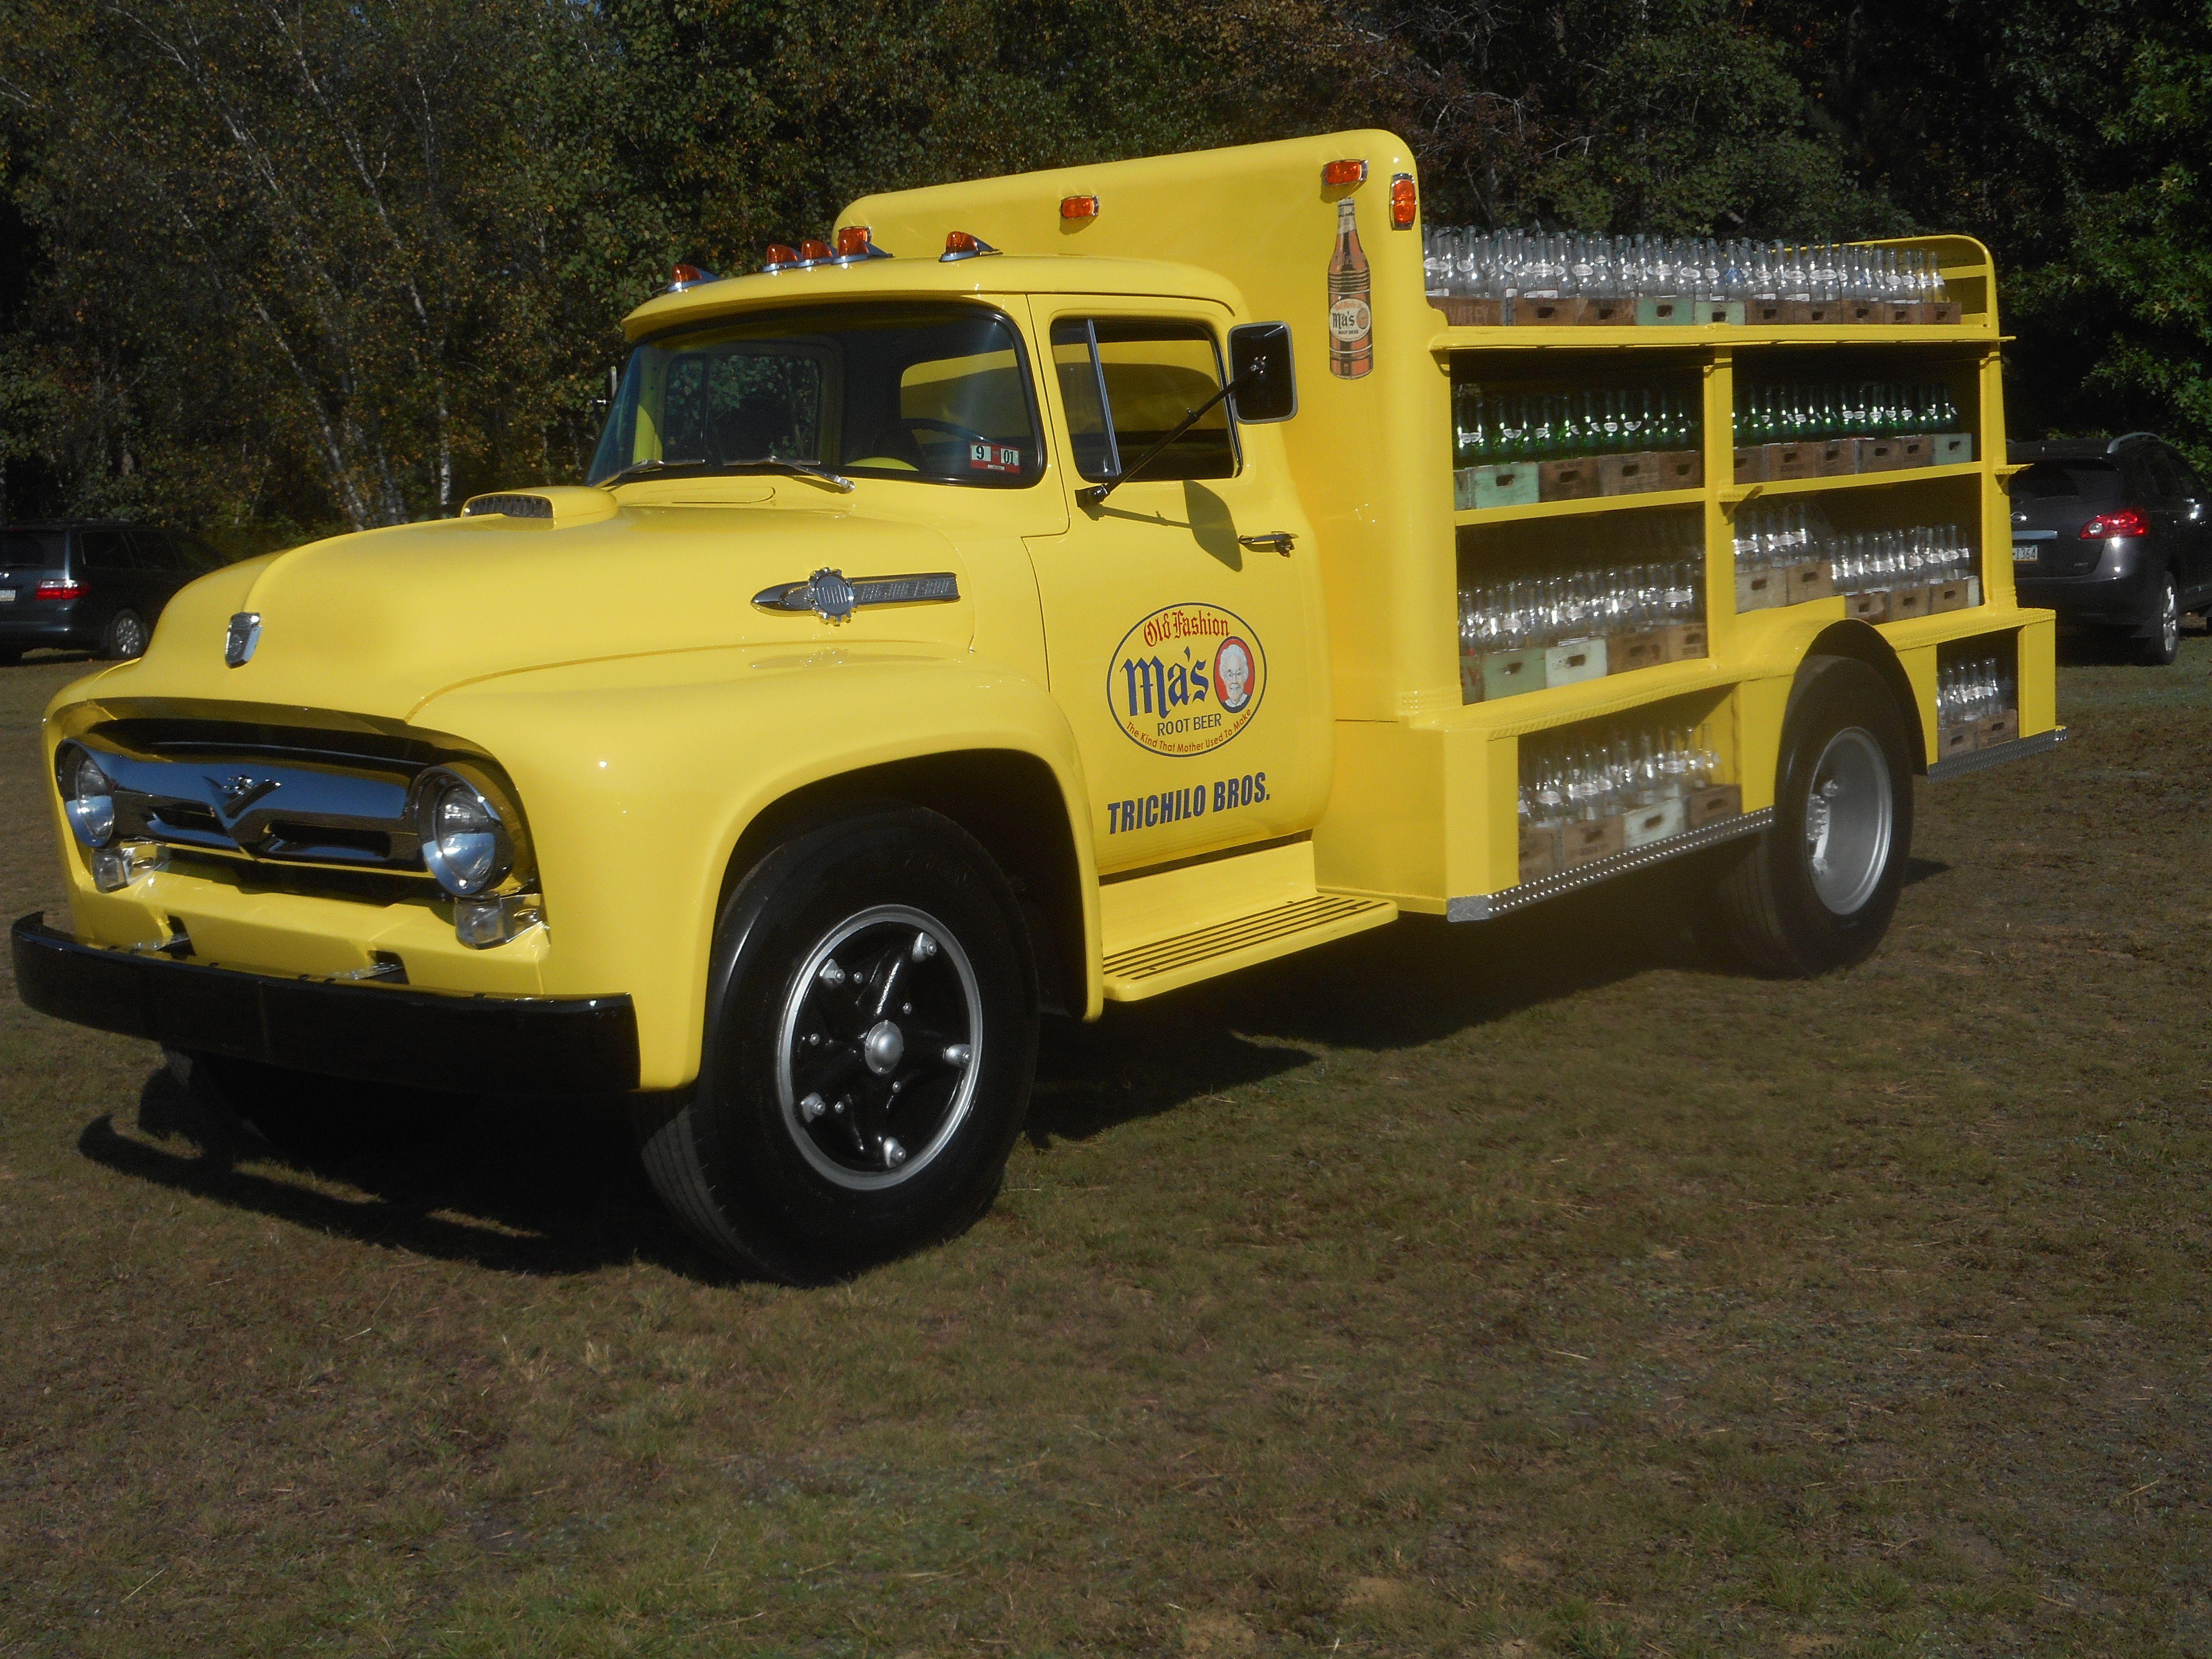 Enchanting Old Rides Trucks Ensign - Classic Cars Ideas - boiq.info